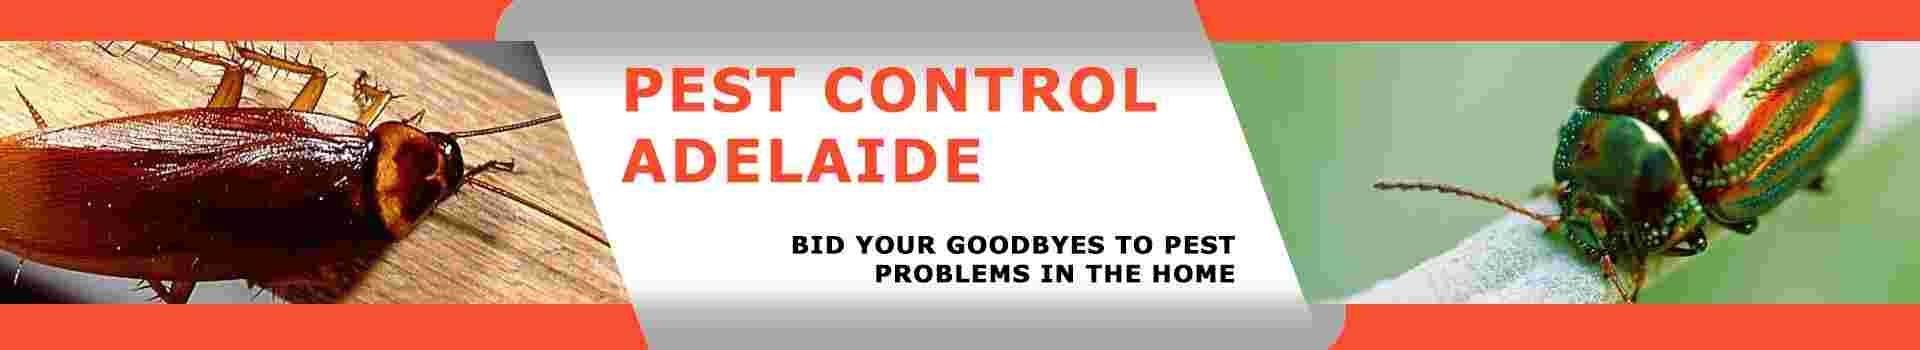 Marks Pest Control Adelaide (@markspestcontroladelaide) Cover Image